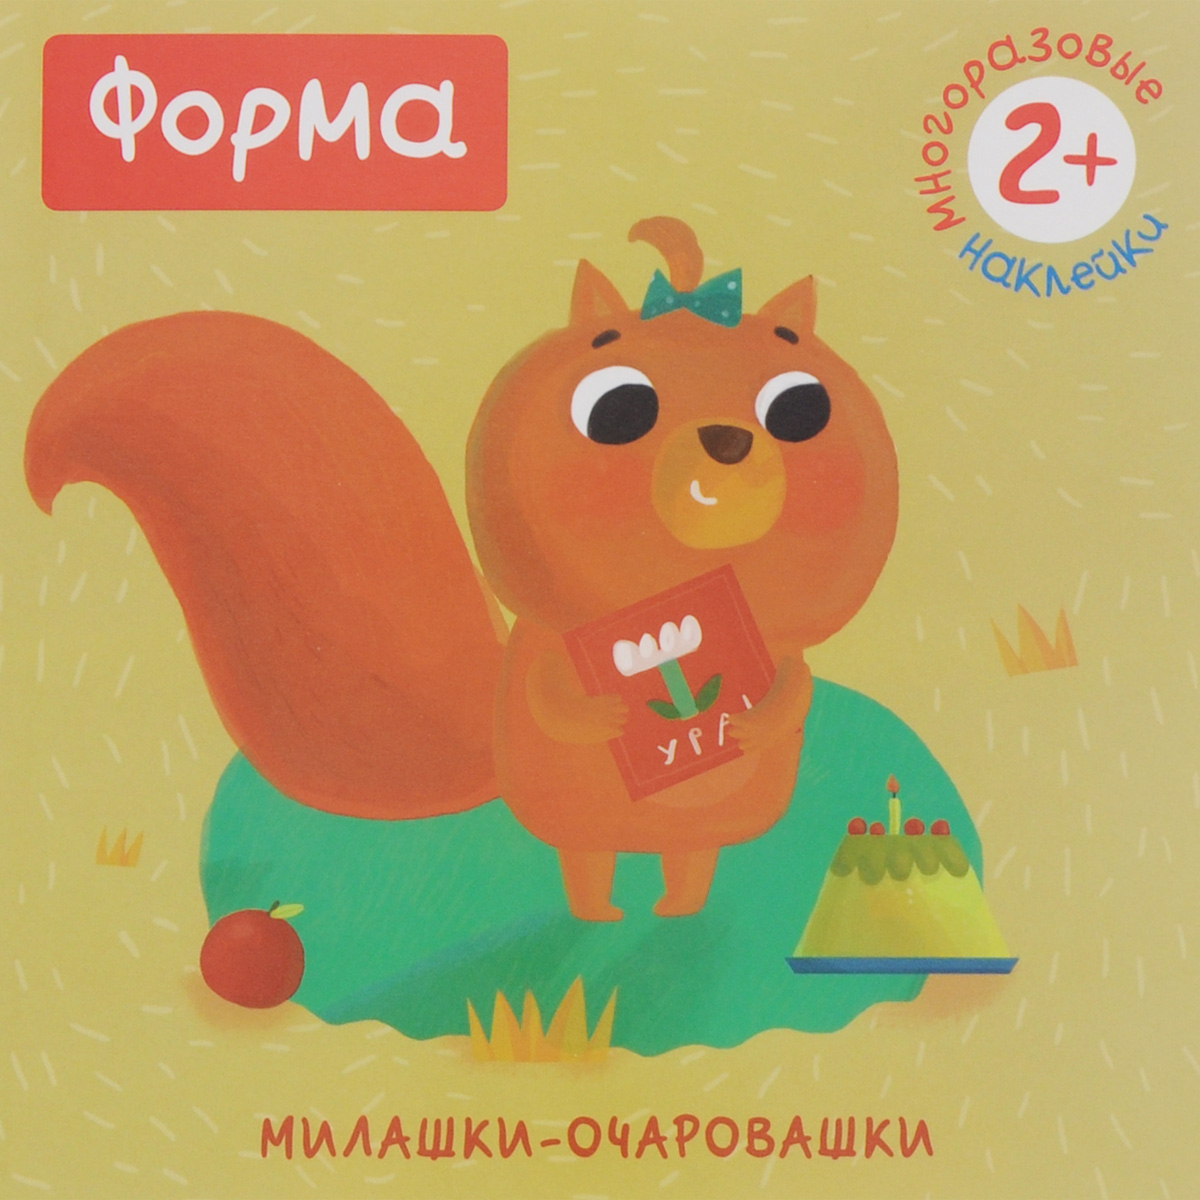 Мария Романова Форма (+ наклейки) мозаика синтез книжка с наклейками милашки очаровашки цвет